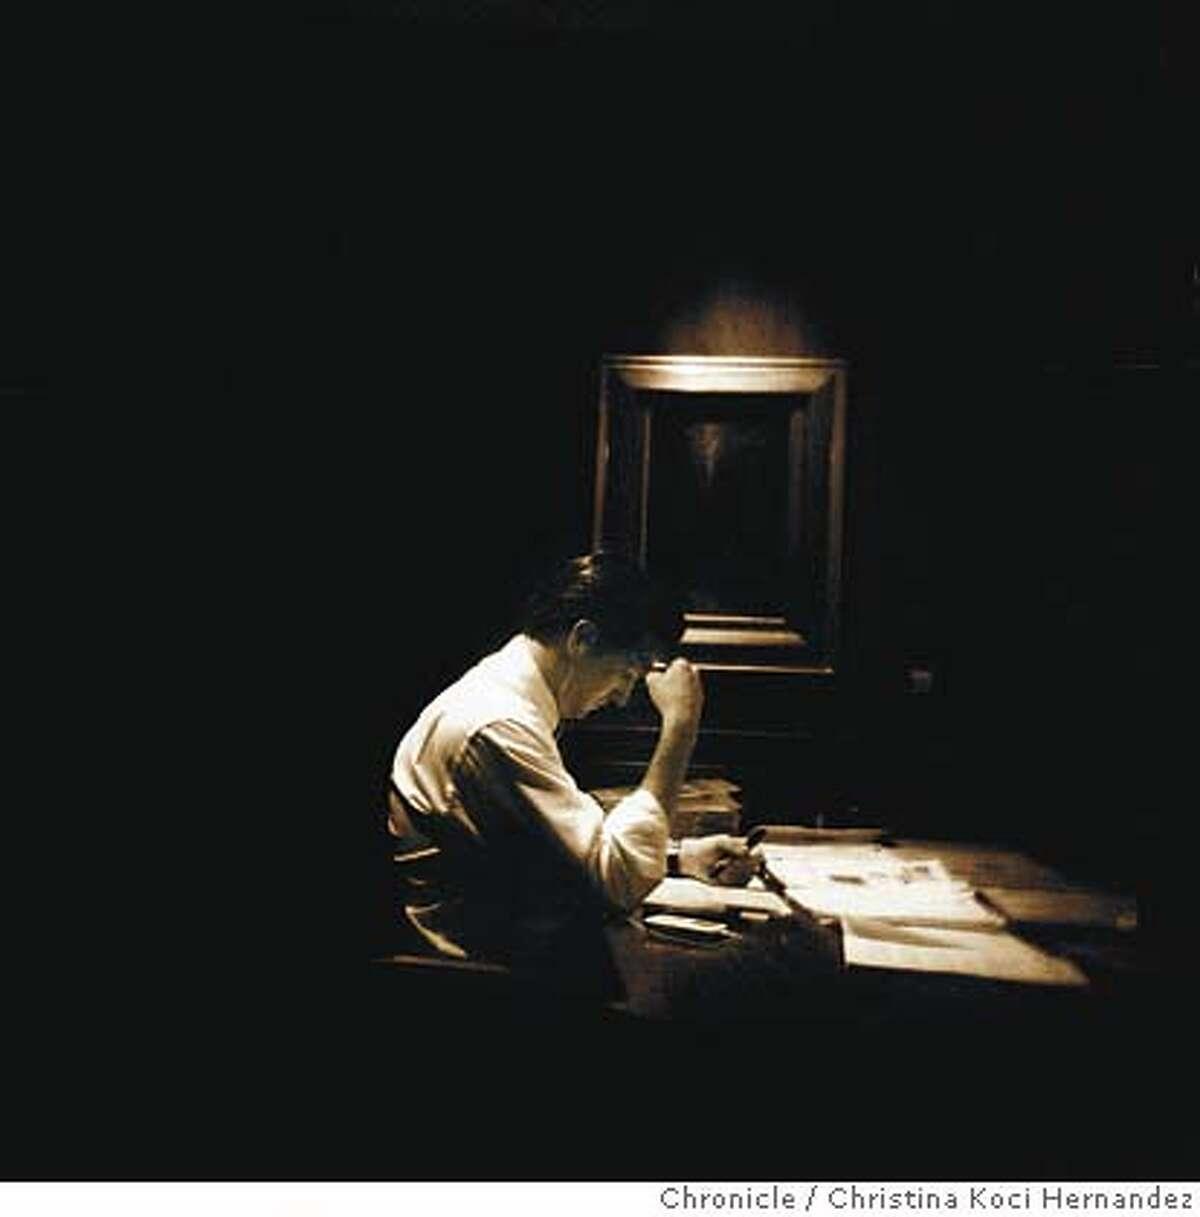 Mayor Gavin Newsom works at his desk at City Hall. Chronicle photo by Christina Koci Hernandez